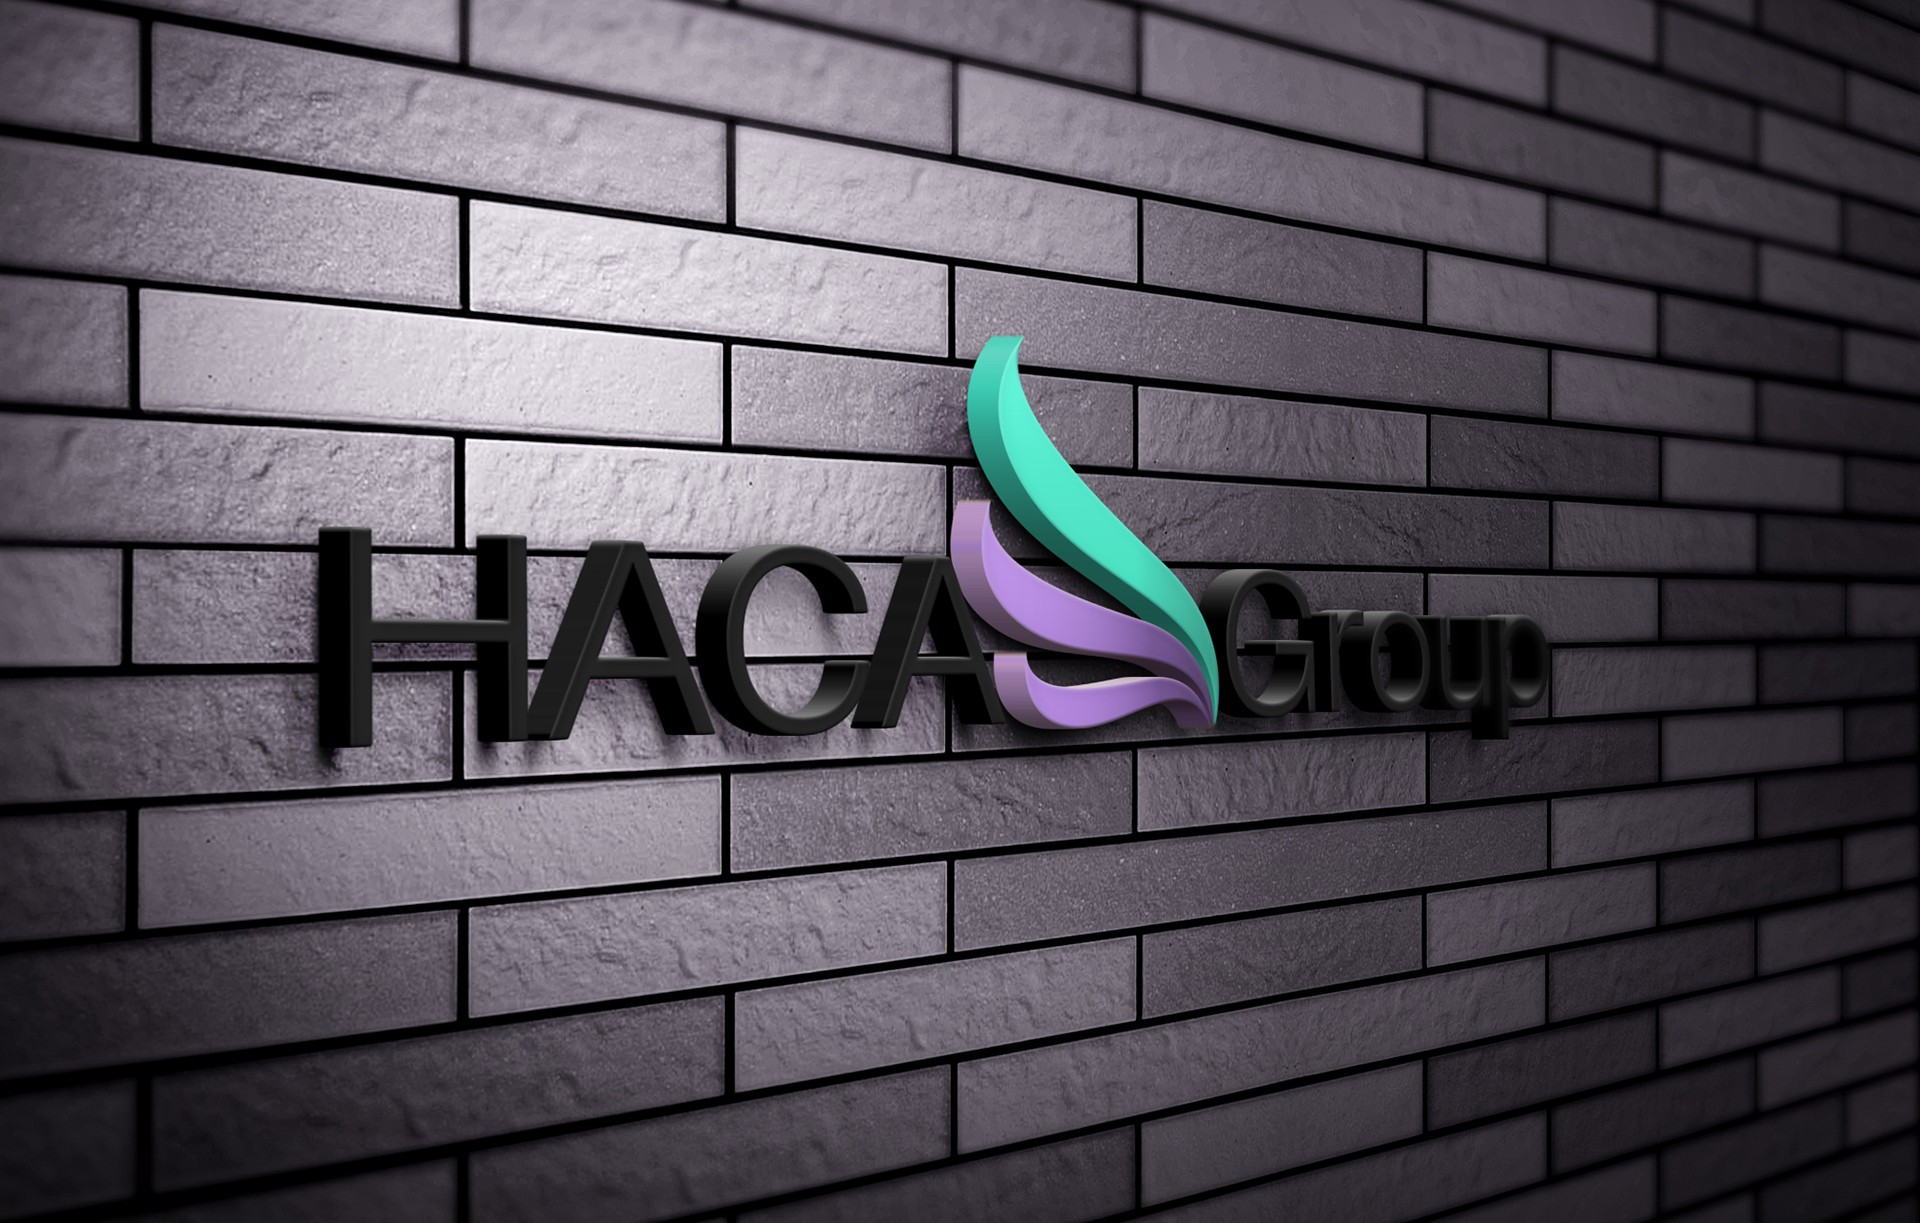 Hacagroup